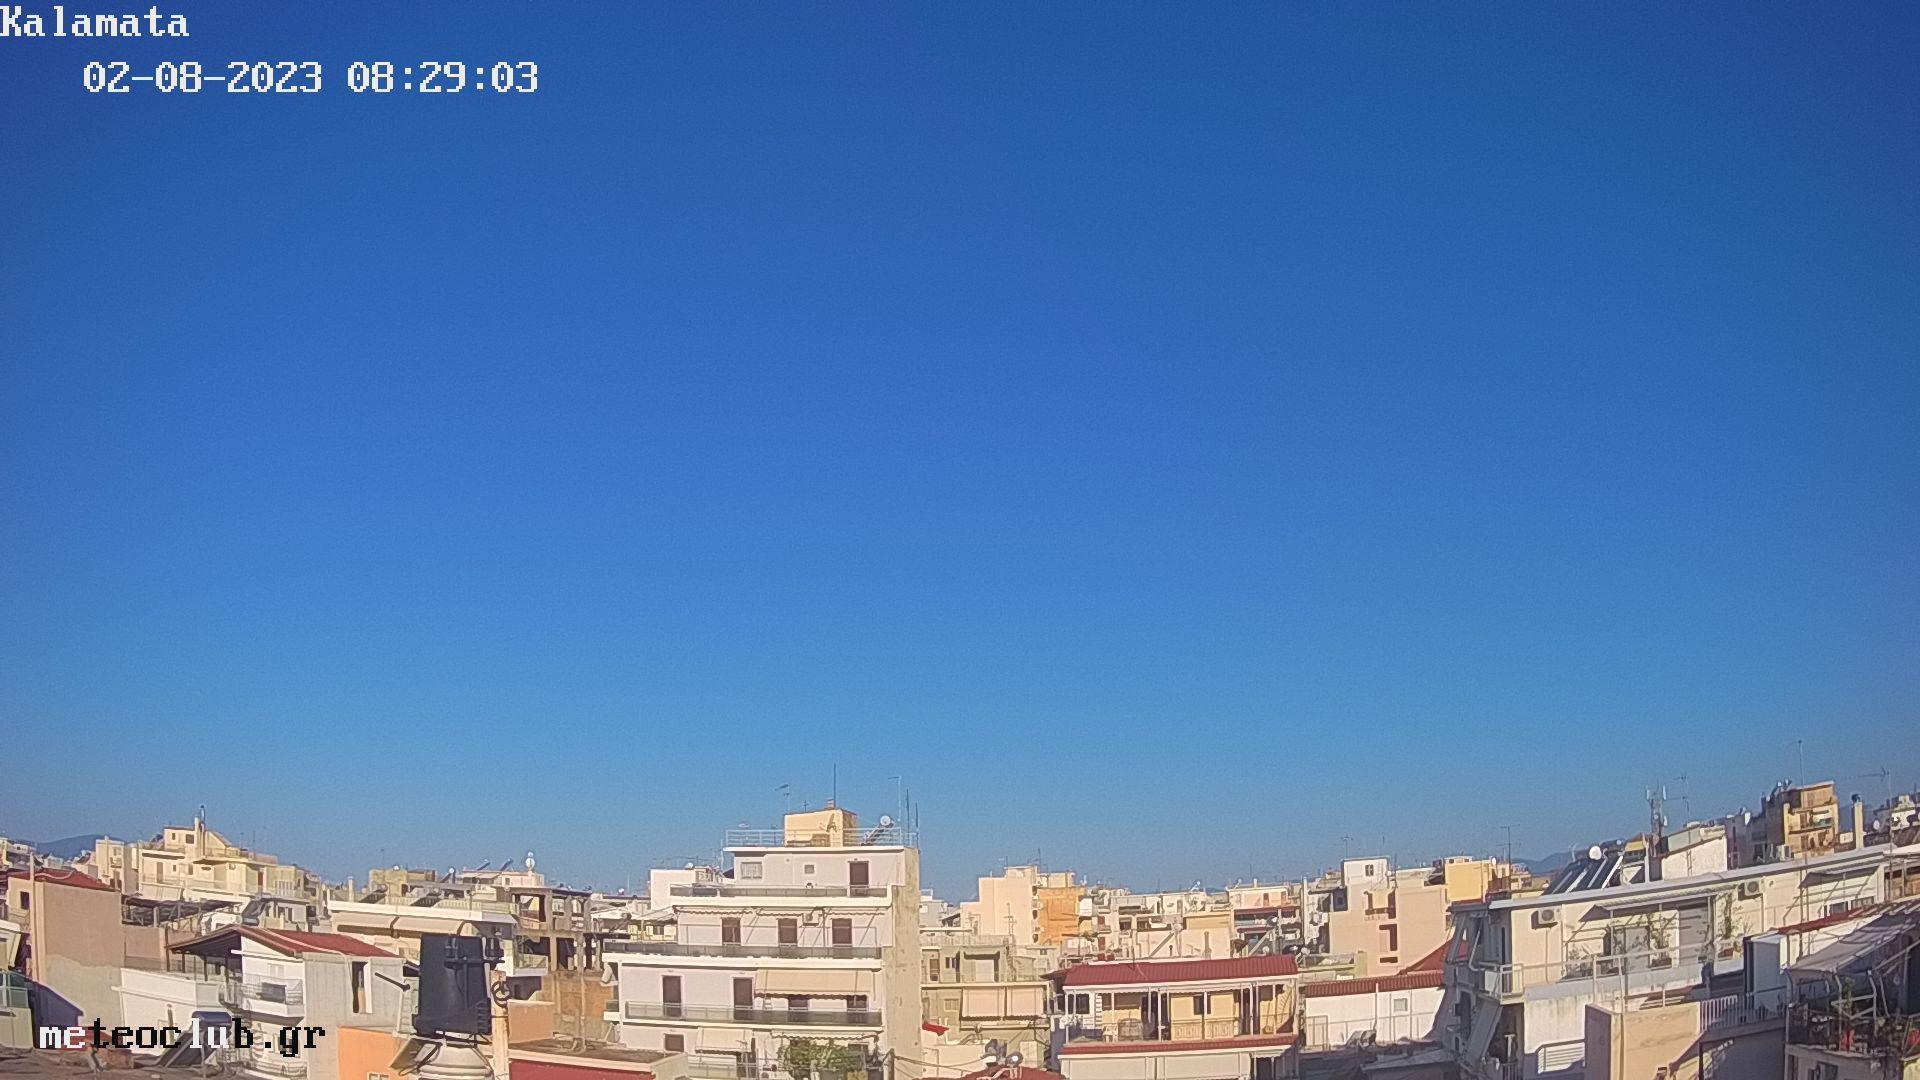 Онлайн веб камера Греция Пелопоннес панорама Каламаты